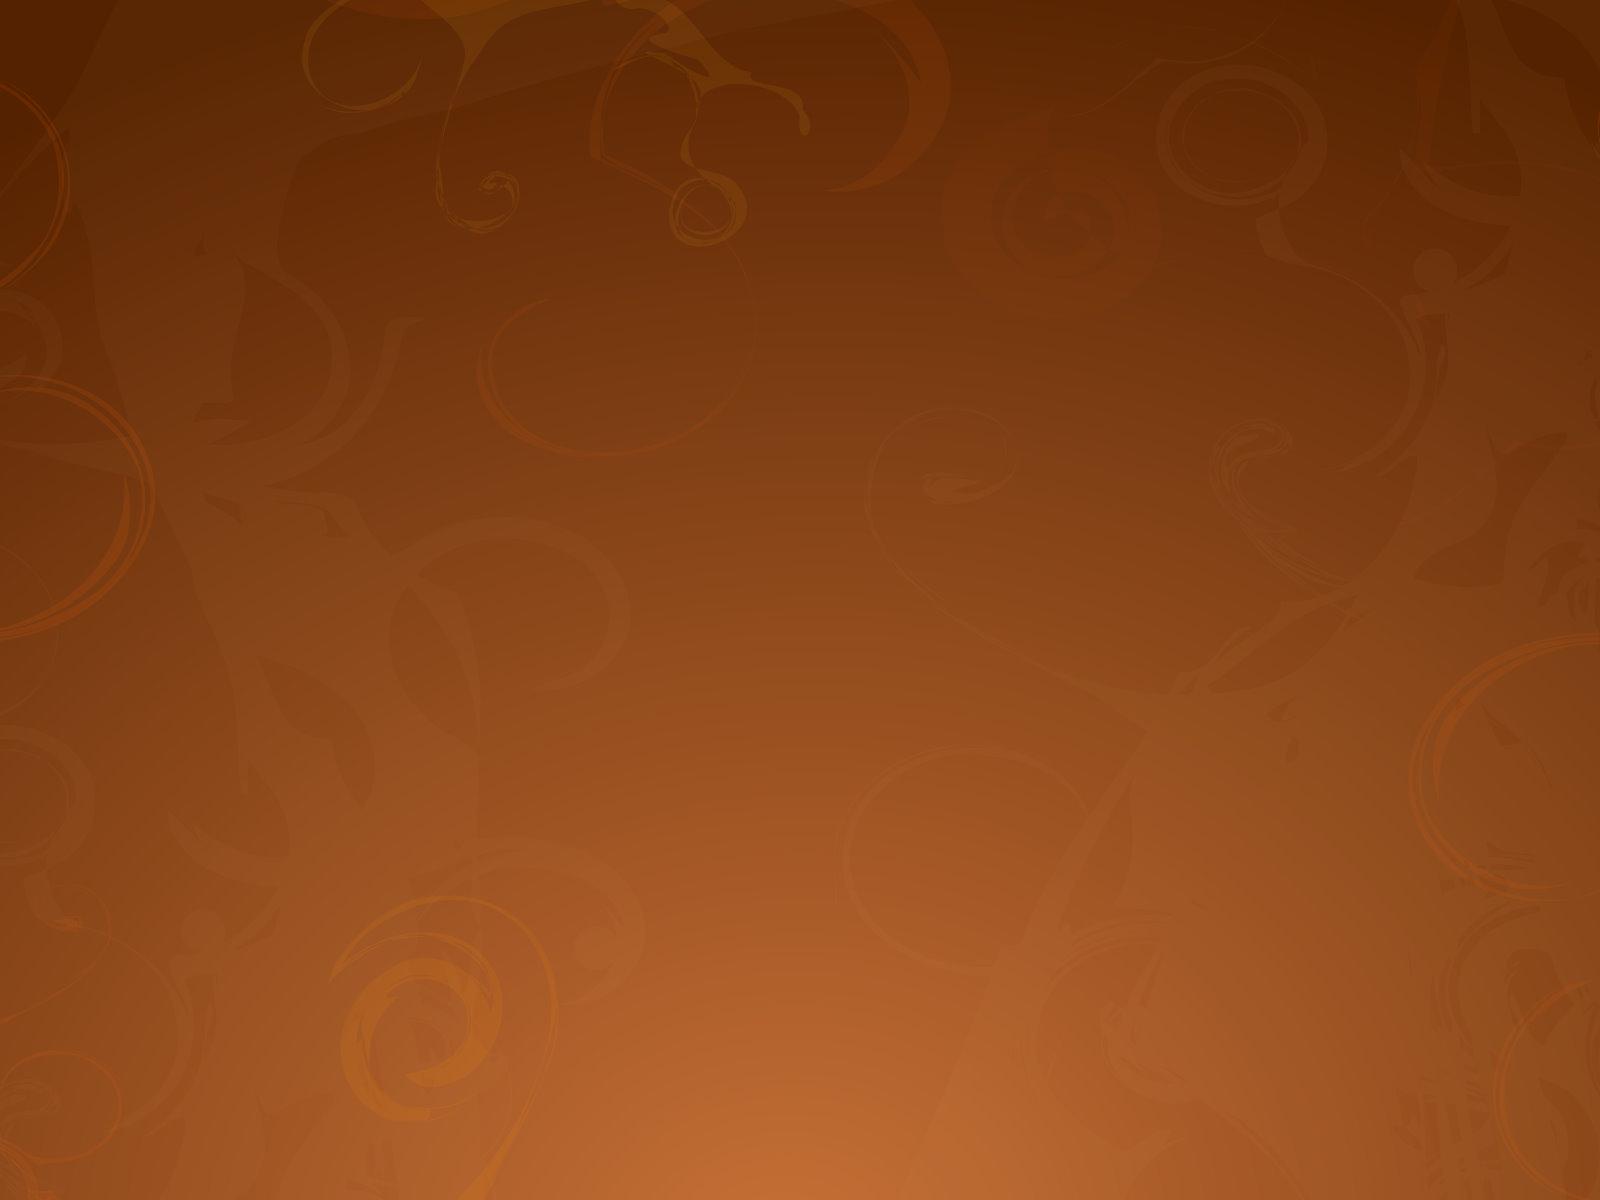 ubuntu official wallpaper 05 - photo #7